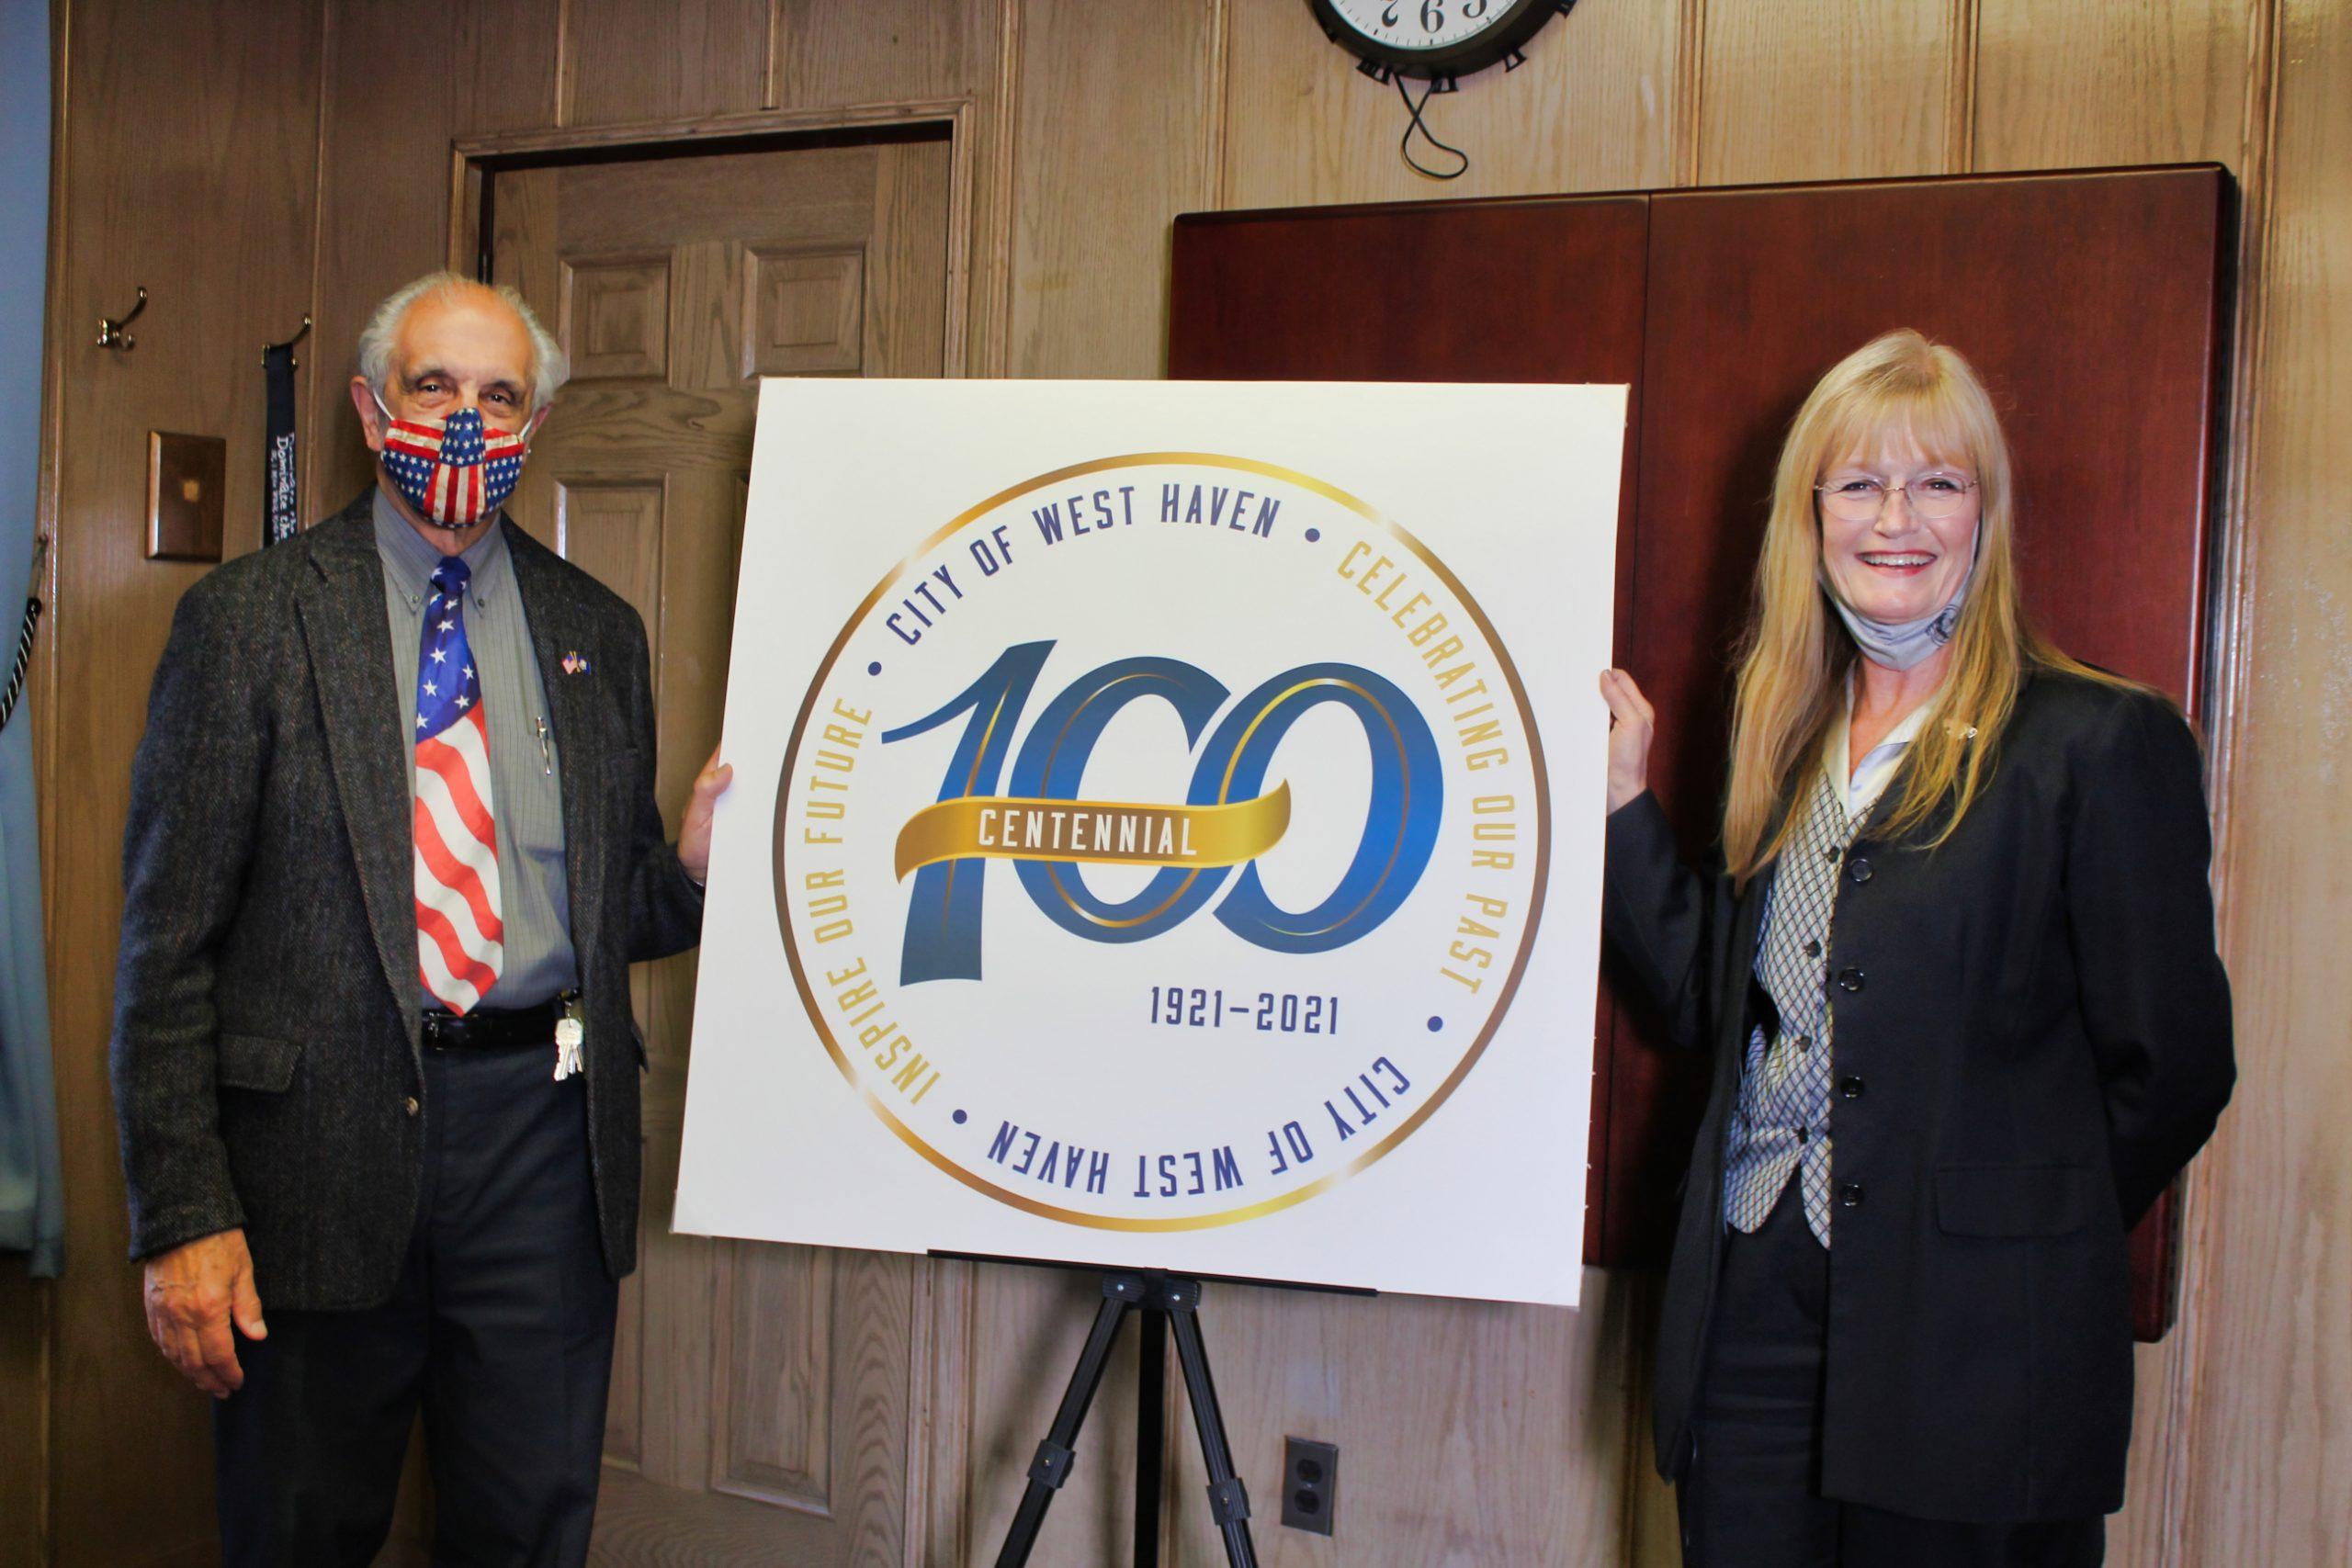 City unveils Centennial Logo